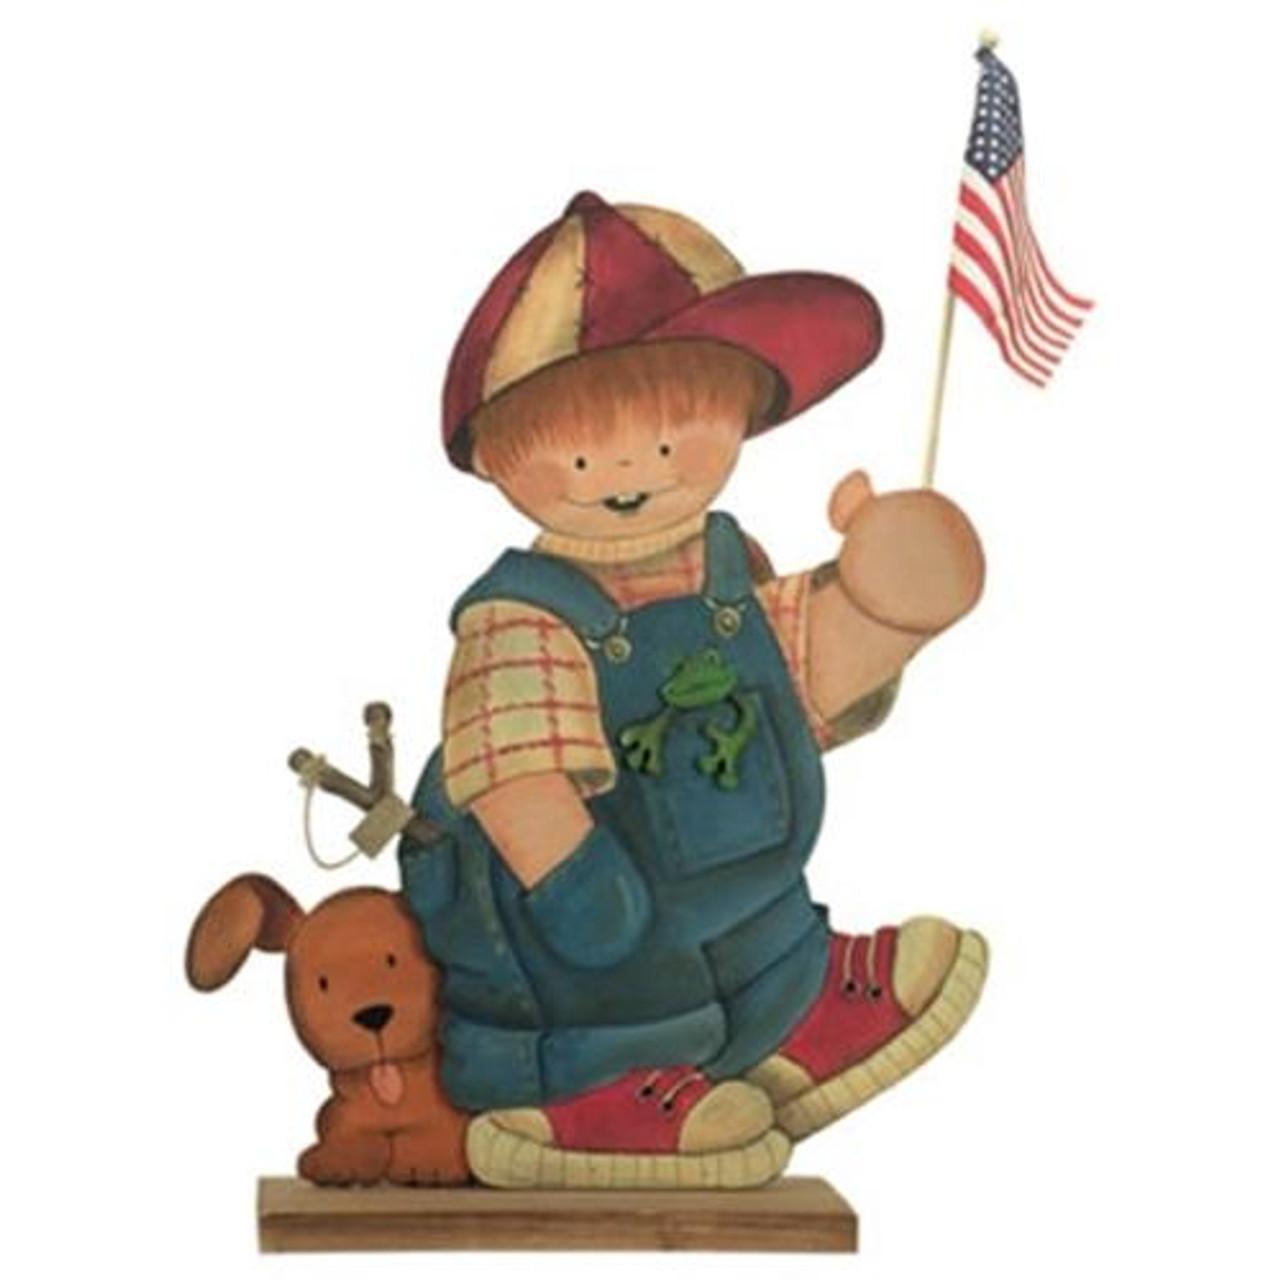 Cherry Tree Toys All American Boy Plan